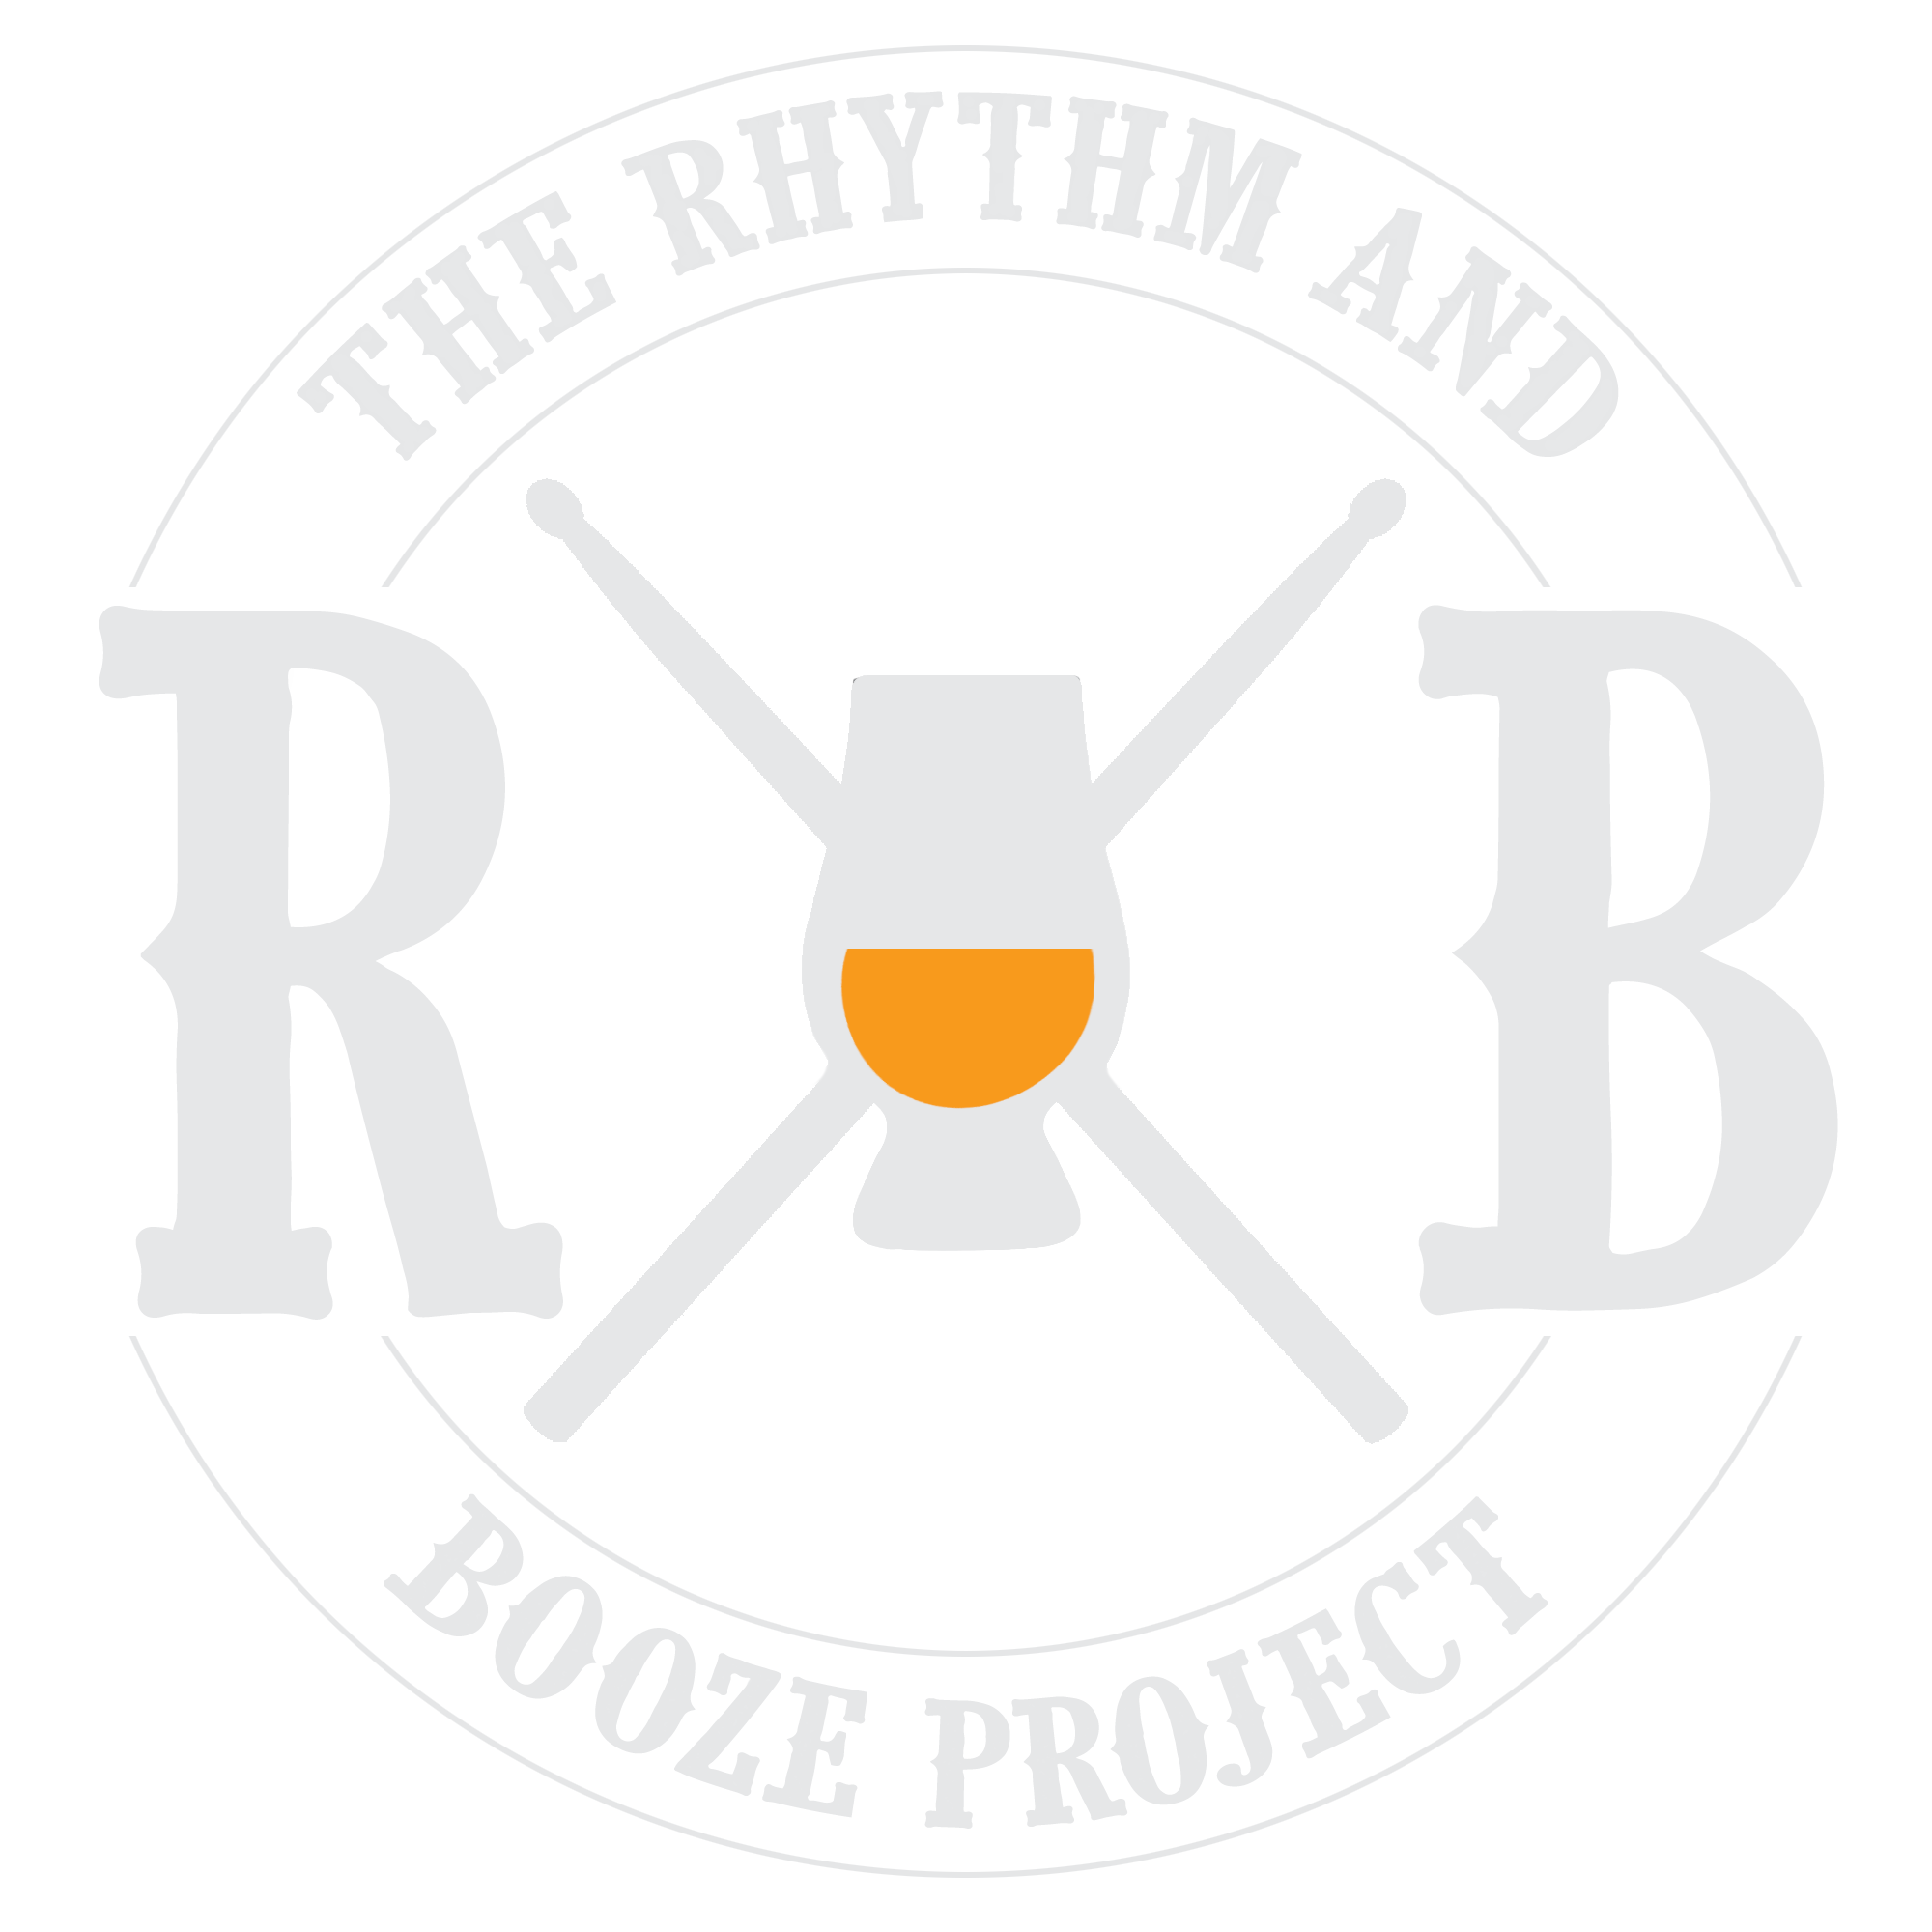 The Rhythm & Booze Project